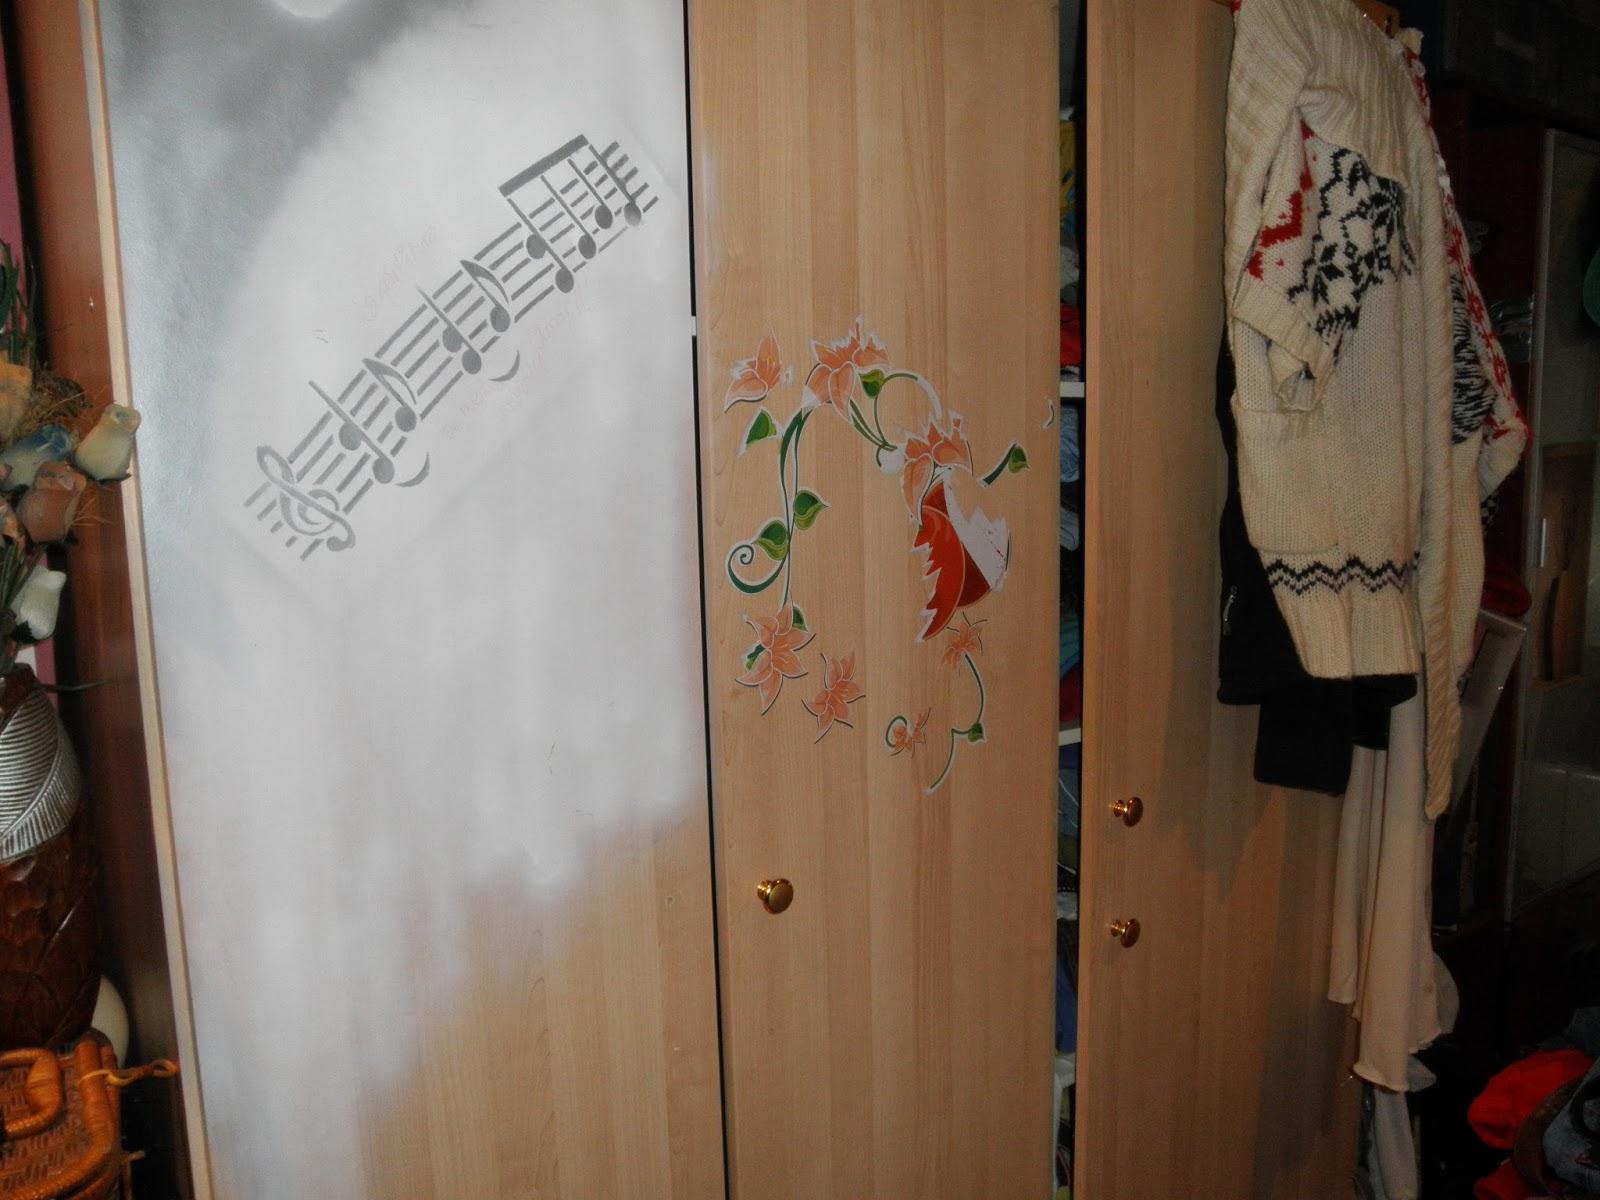 Dise a tu entorno restauraci n de armario - Disena tu armario ...